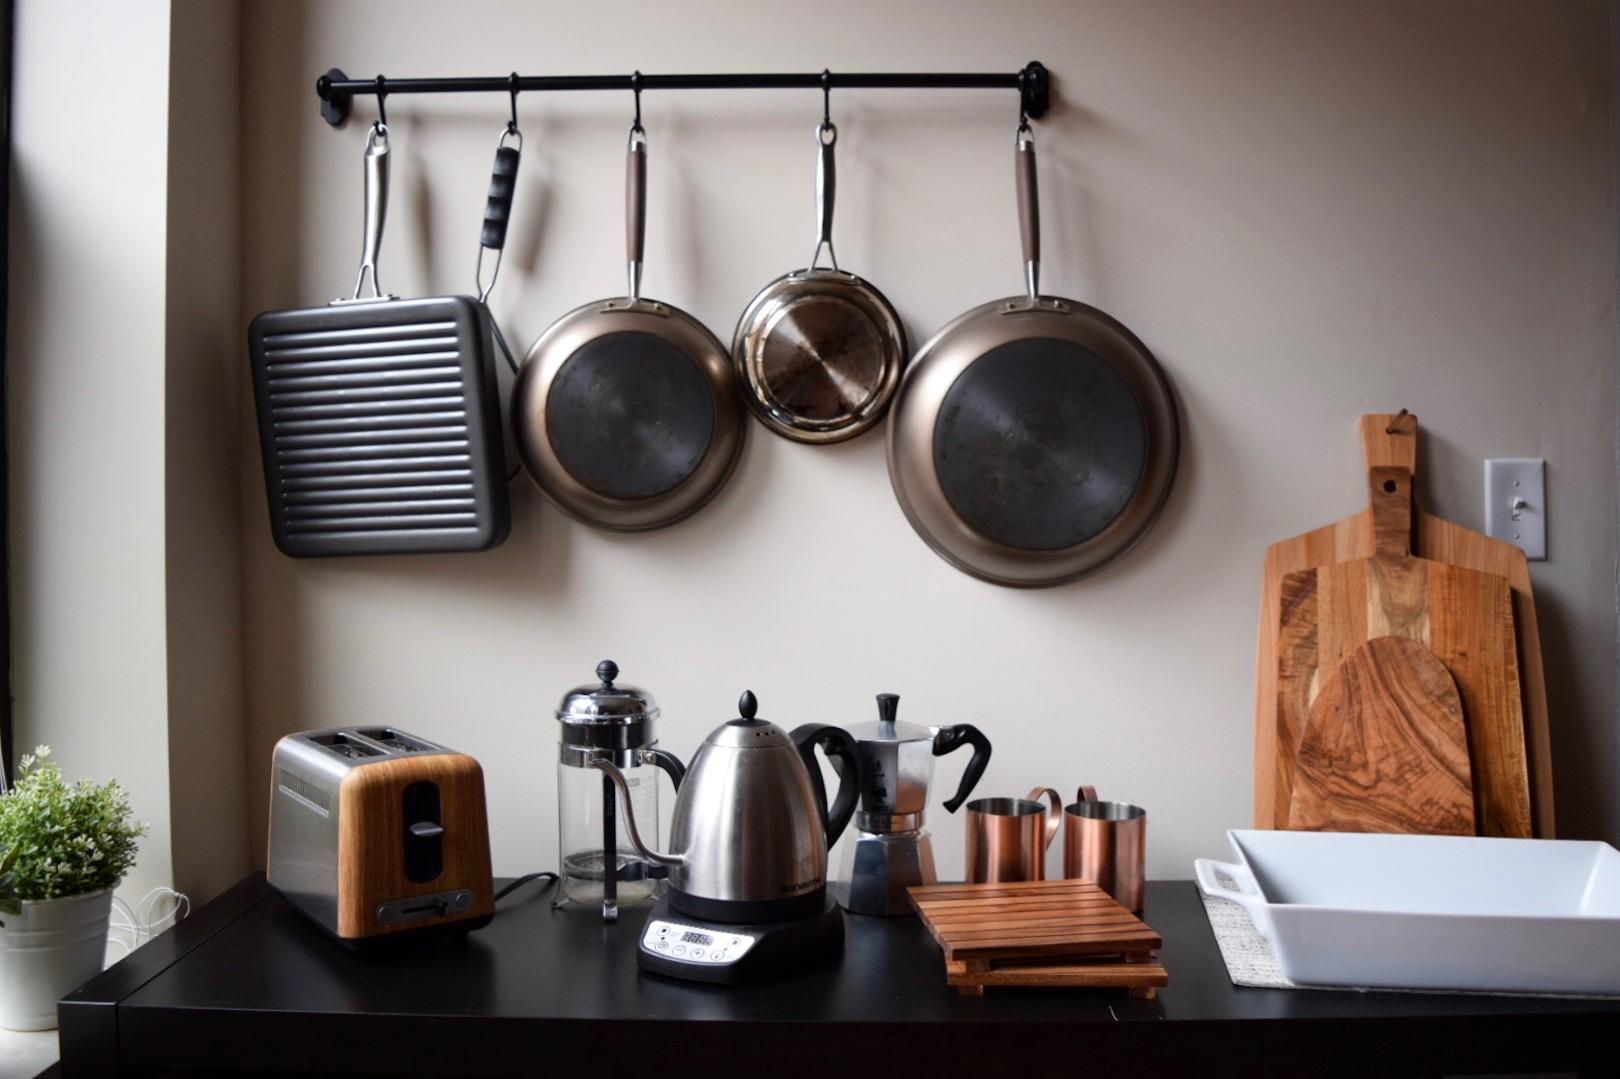 ikea-kitchen-wall-storage-rack